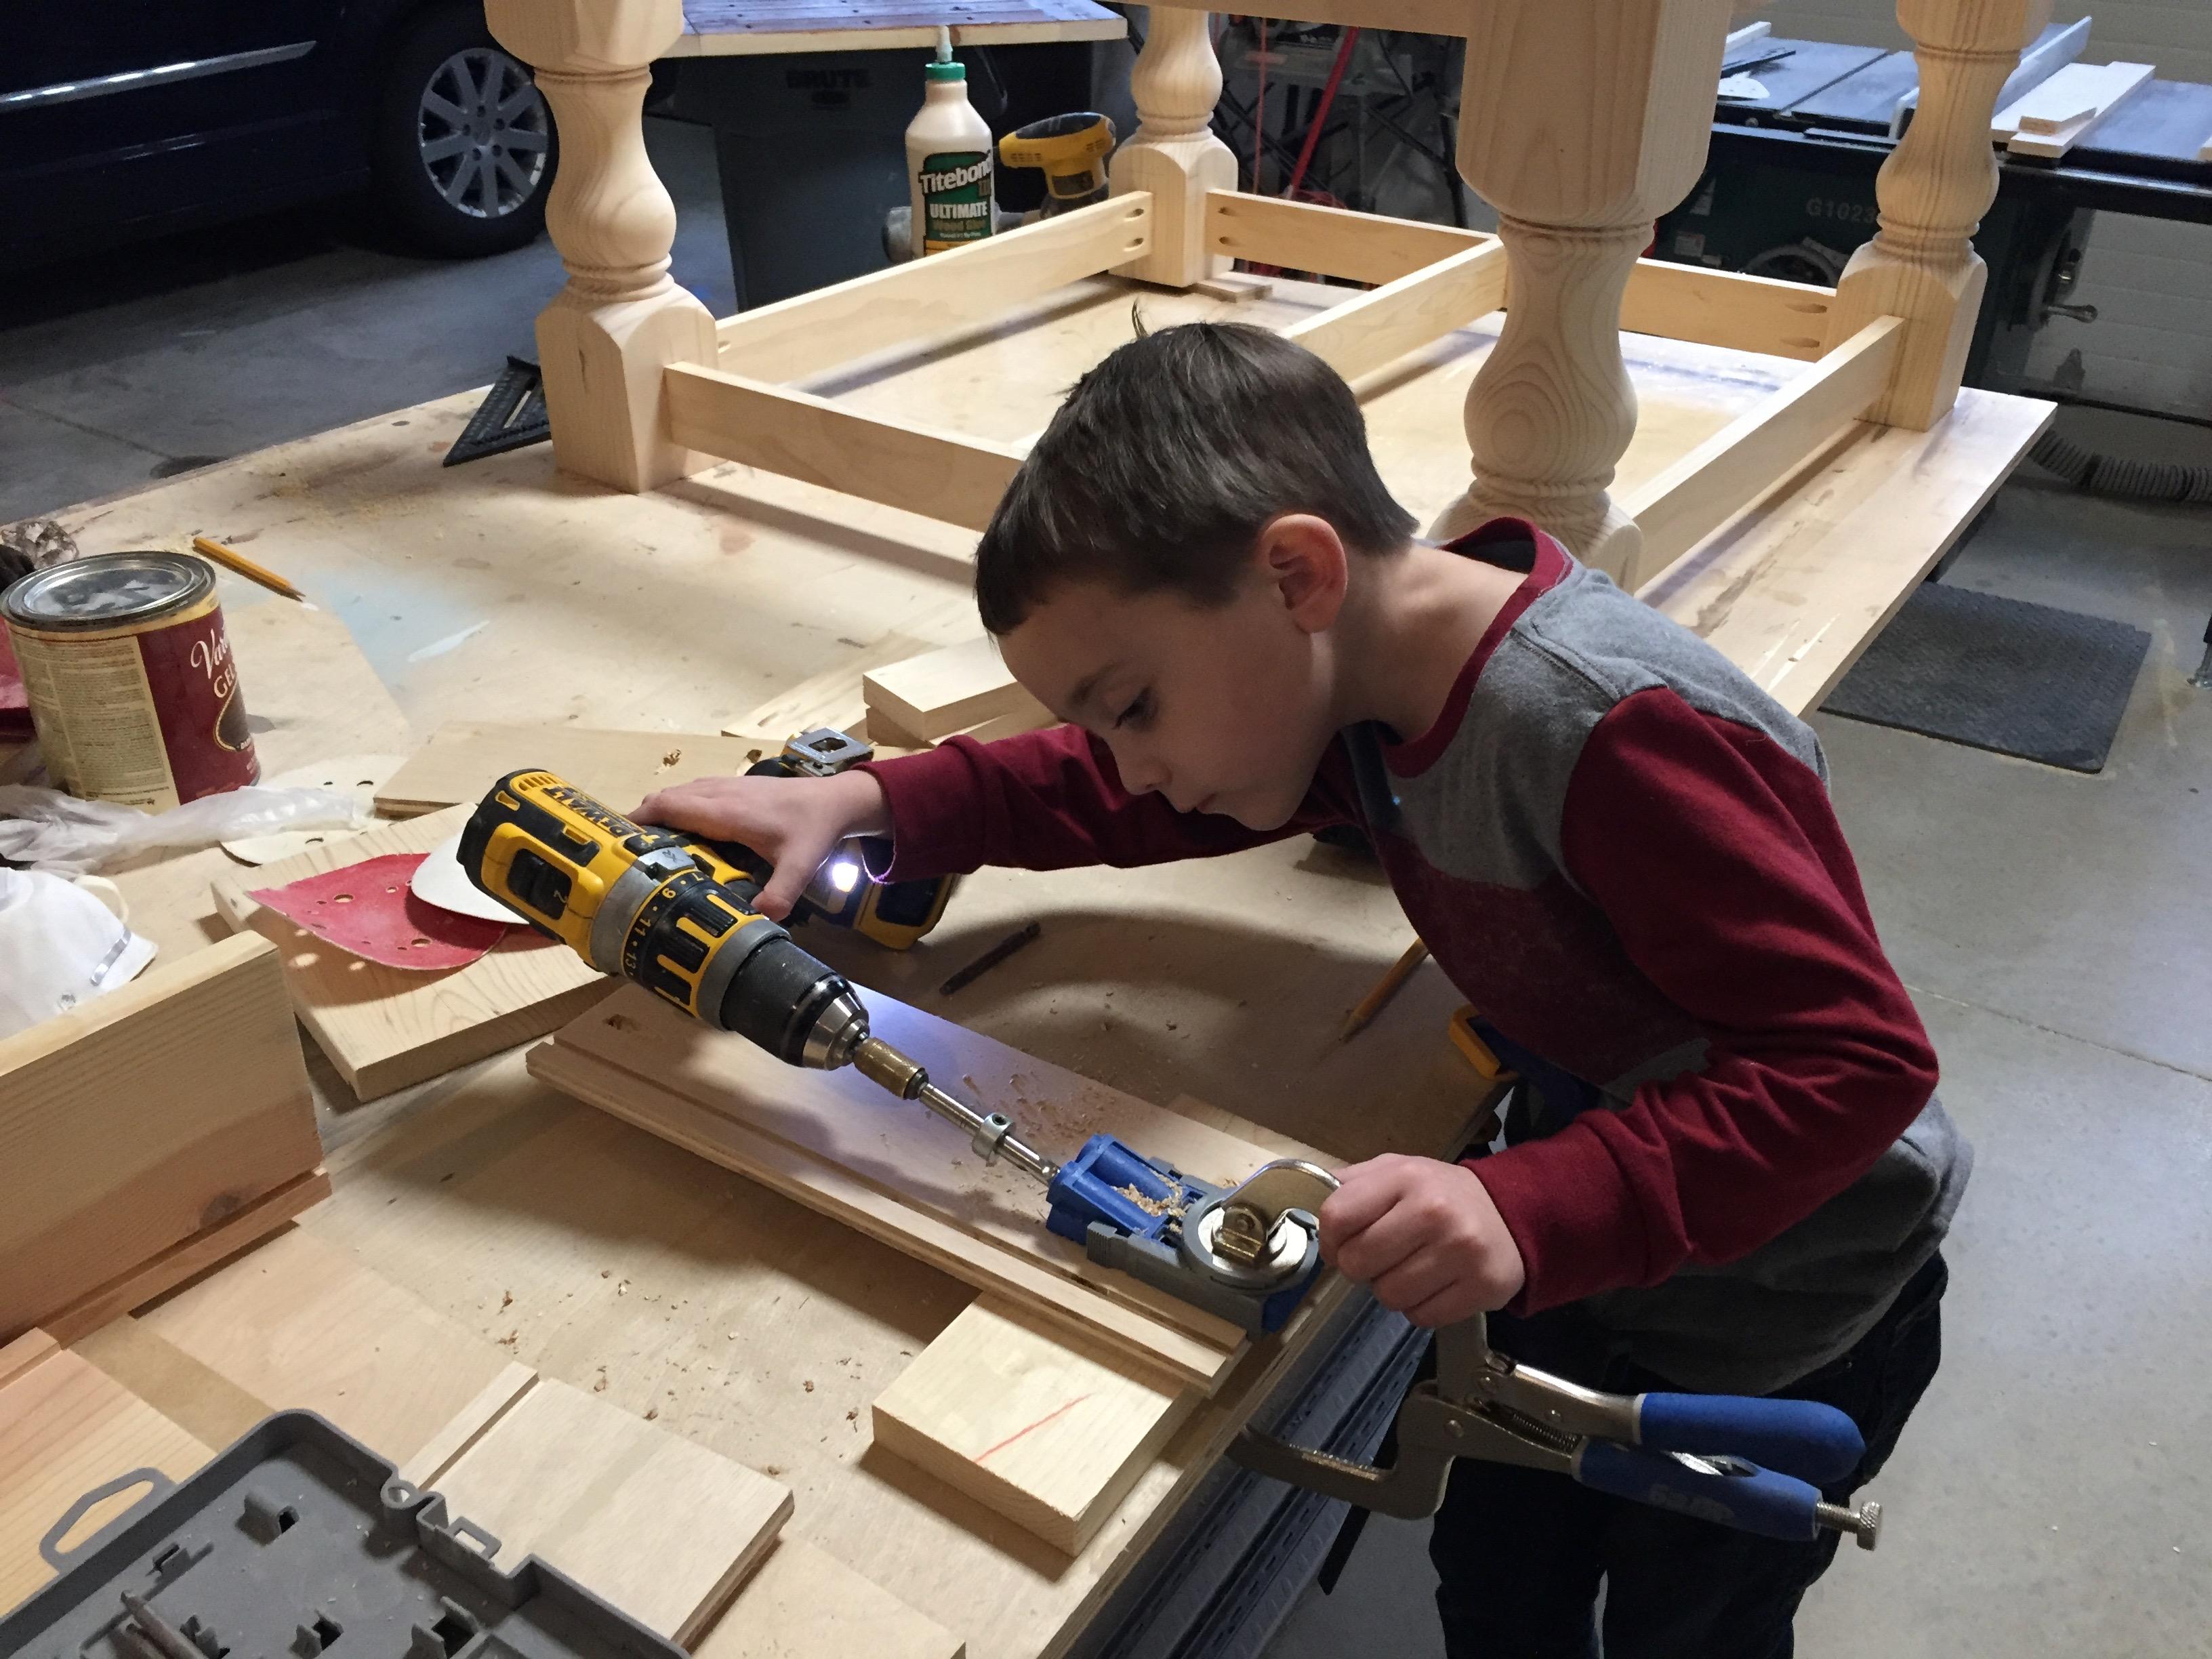 5 Year old son using a Kreg Jig R3